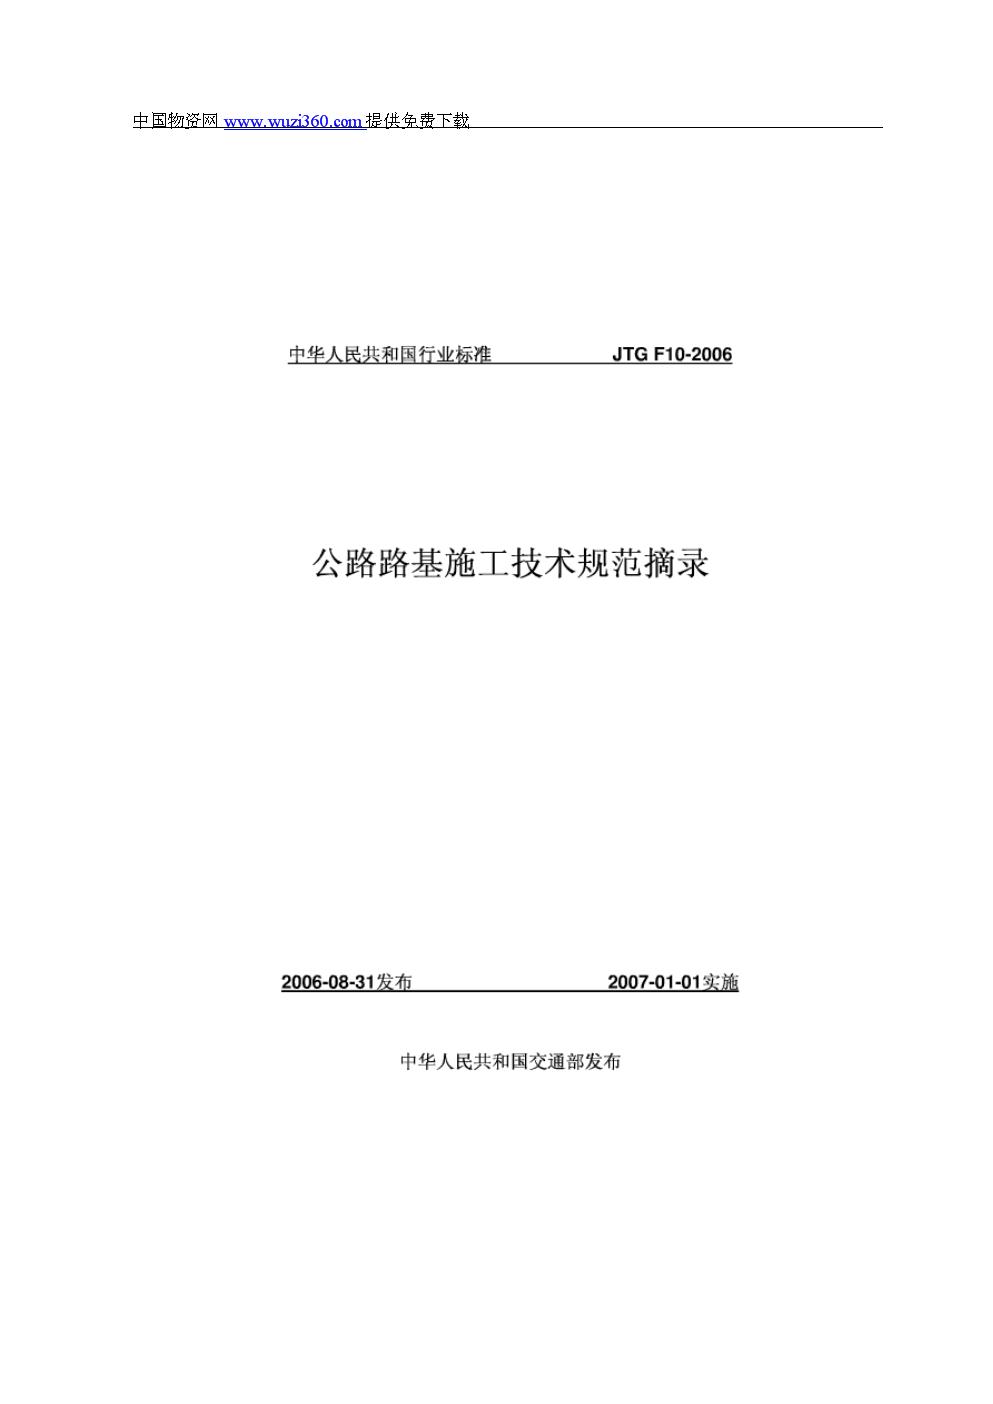 JTG_F10-2006_公路路基施工技术规范.doc